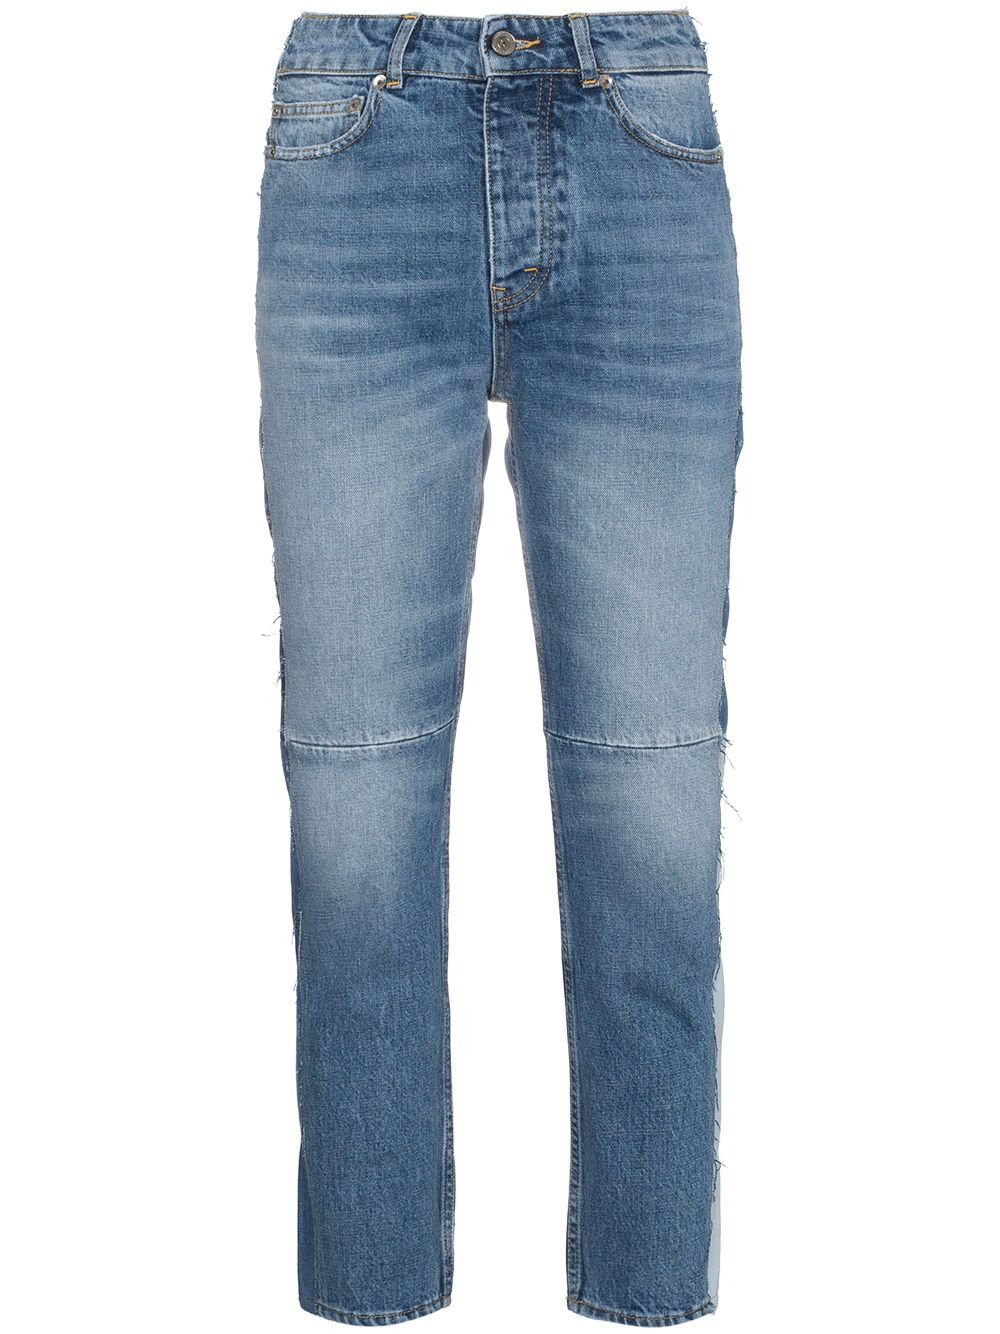 blue Mid rise patchwork jeans  GOLDEN GOOSE |  | G32WP006.A2A2